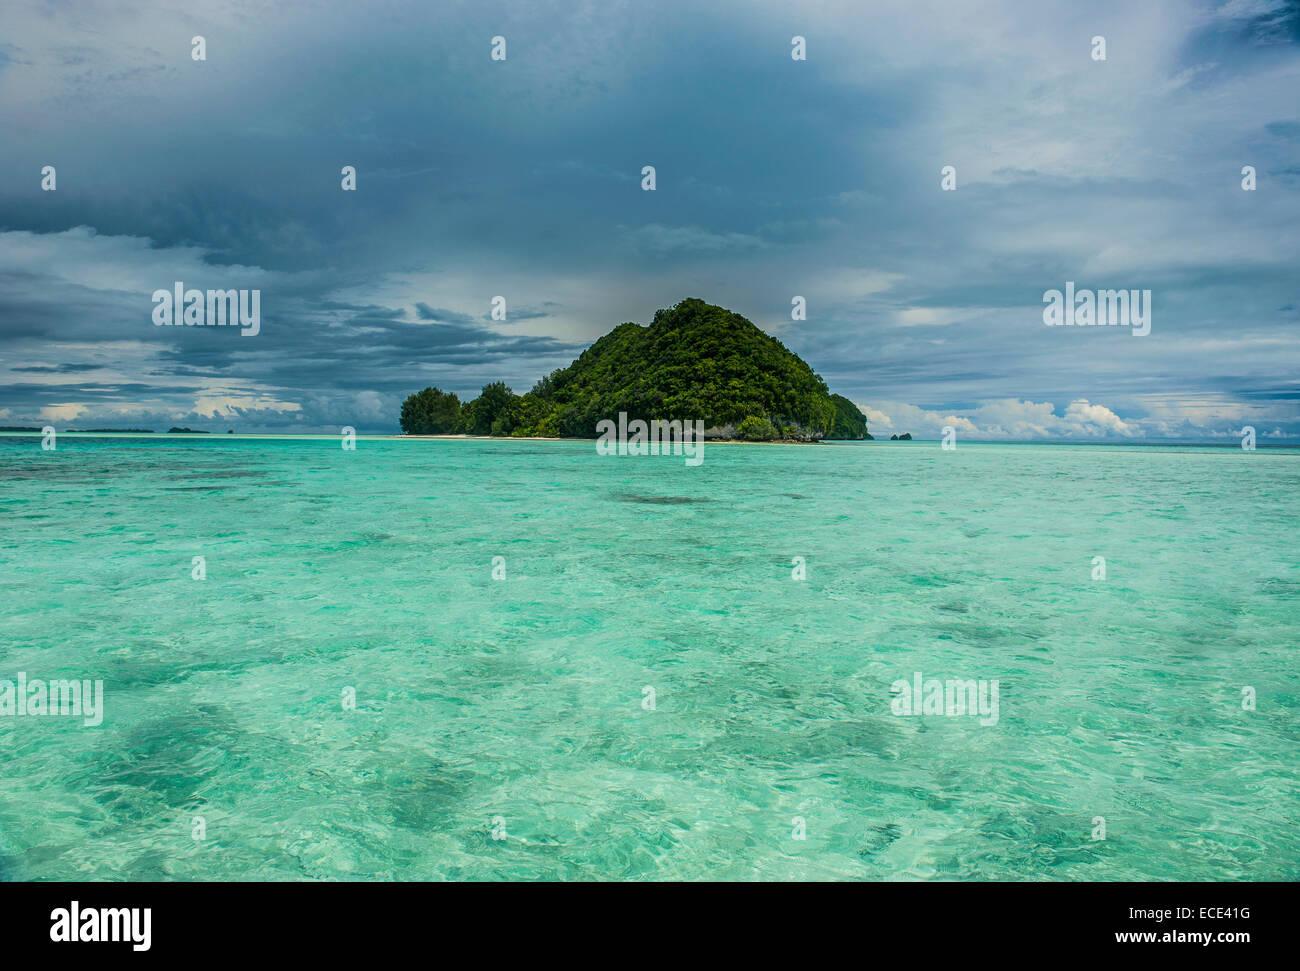 Islet, Rock Islands, Palau, Micronesia - Stock Image